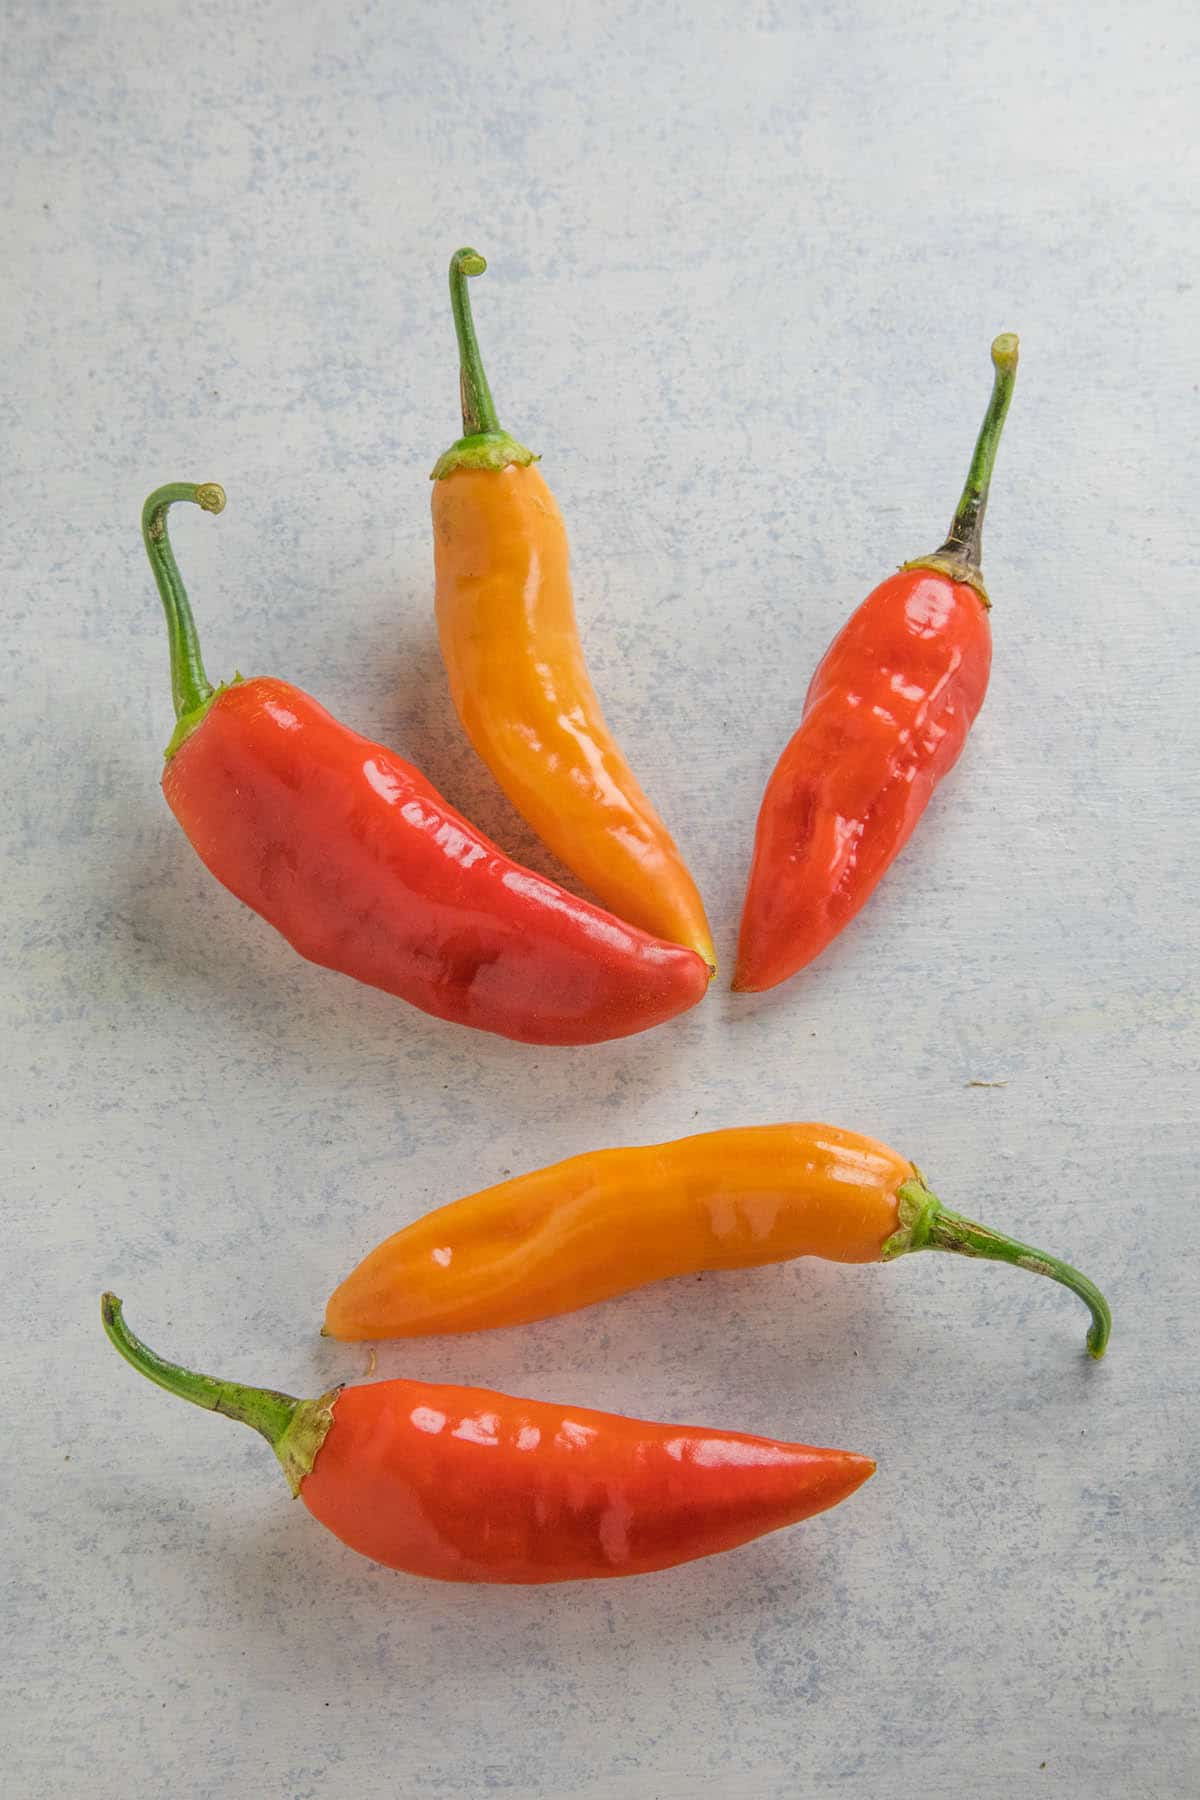 Aji Limo Chili Peppers